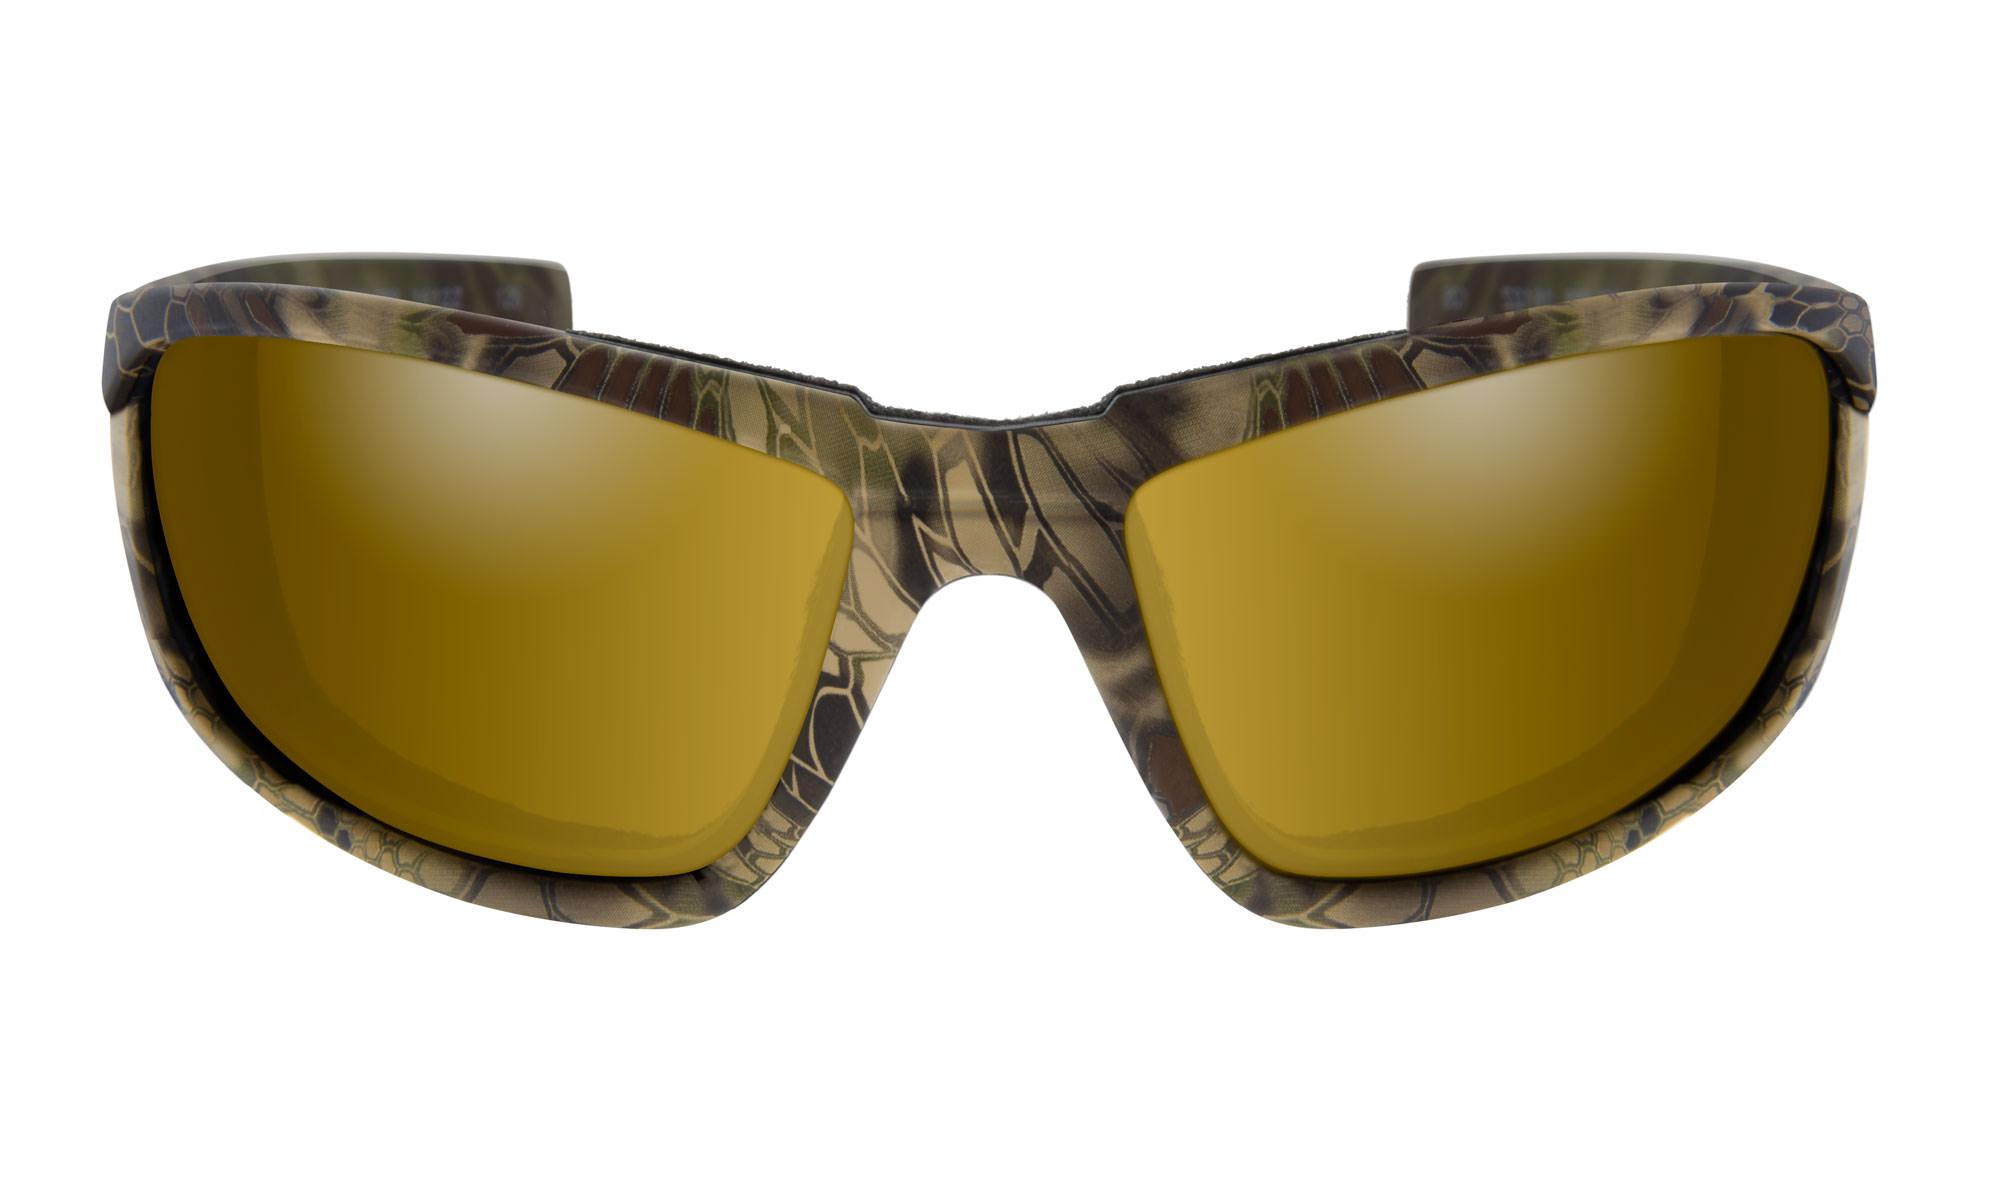 ba79083c1 Wiley-X WX Boss Kryptek® Highlander™ with Polarized Venice Gold ...